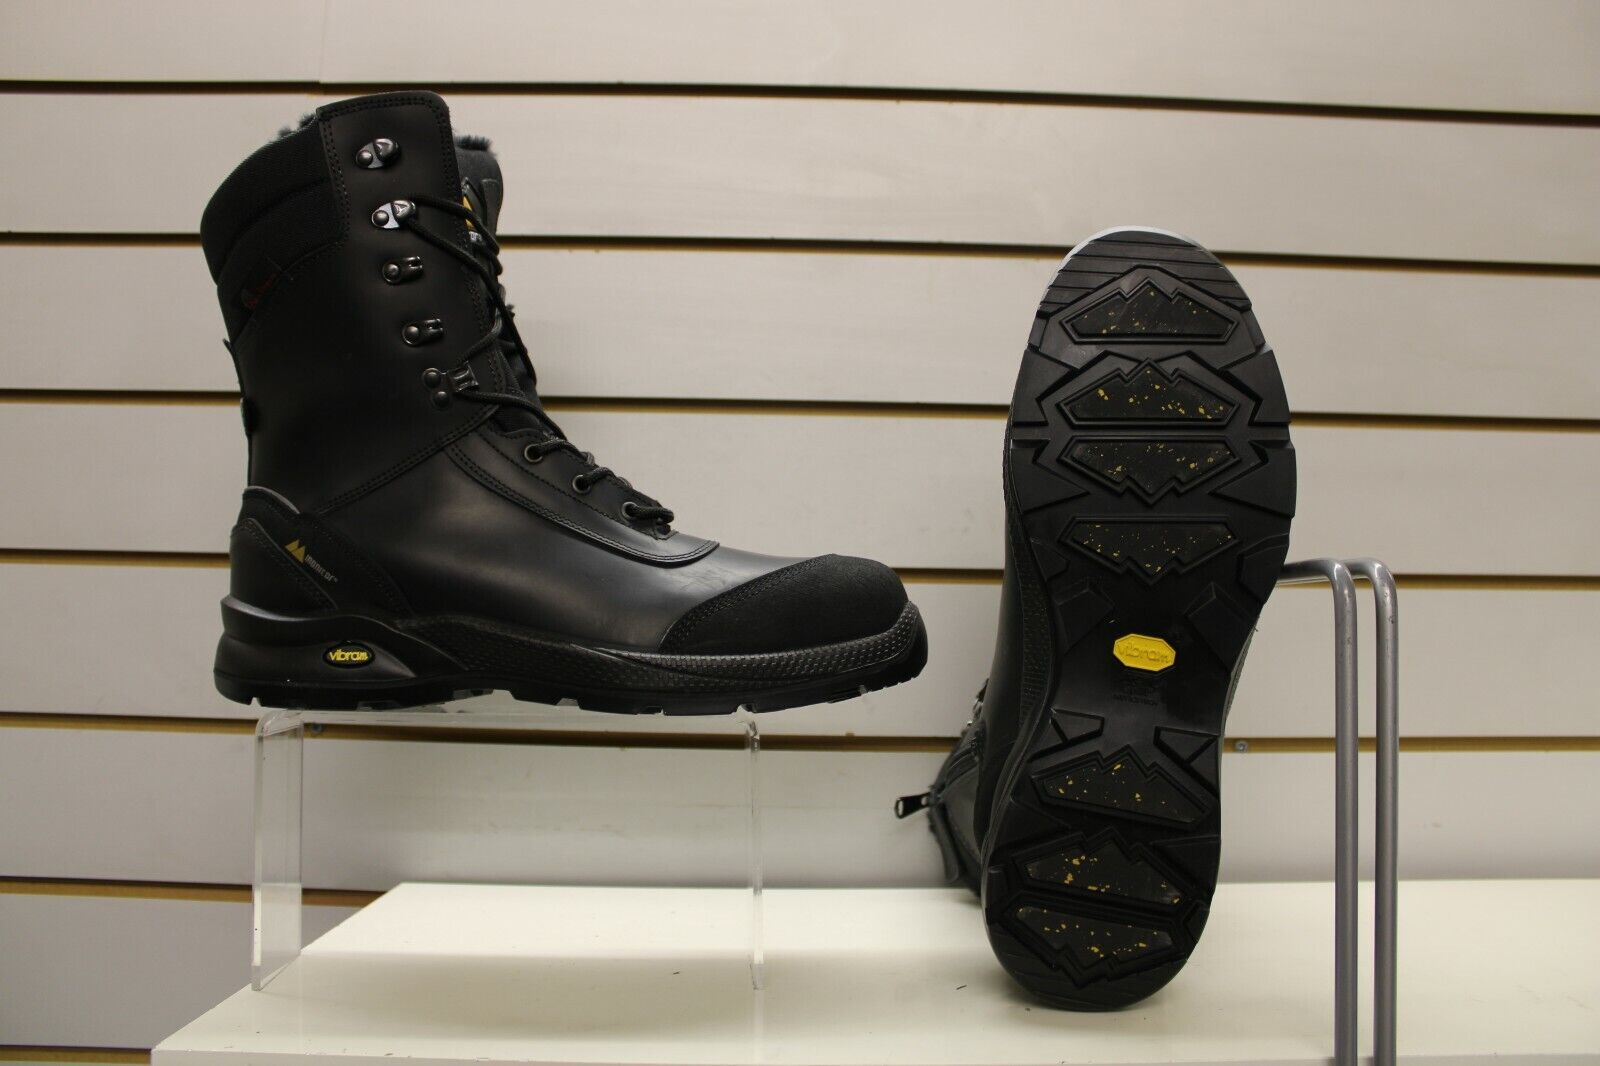 Monitor Icebreaker Arctic Black Side Zip Safety Boots UK 10.5 EU 45 Grisport